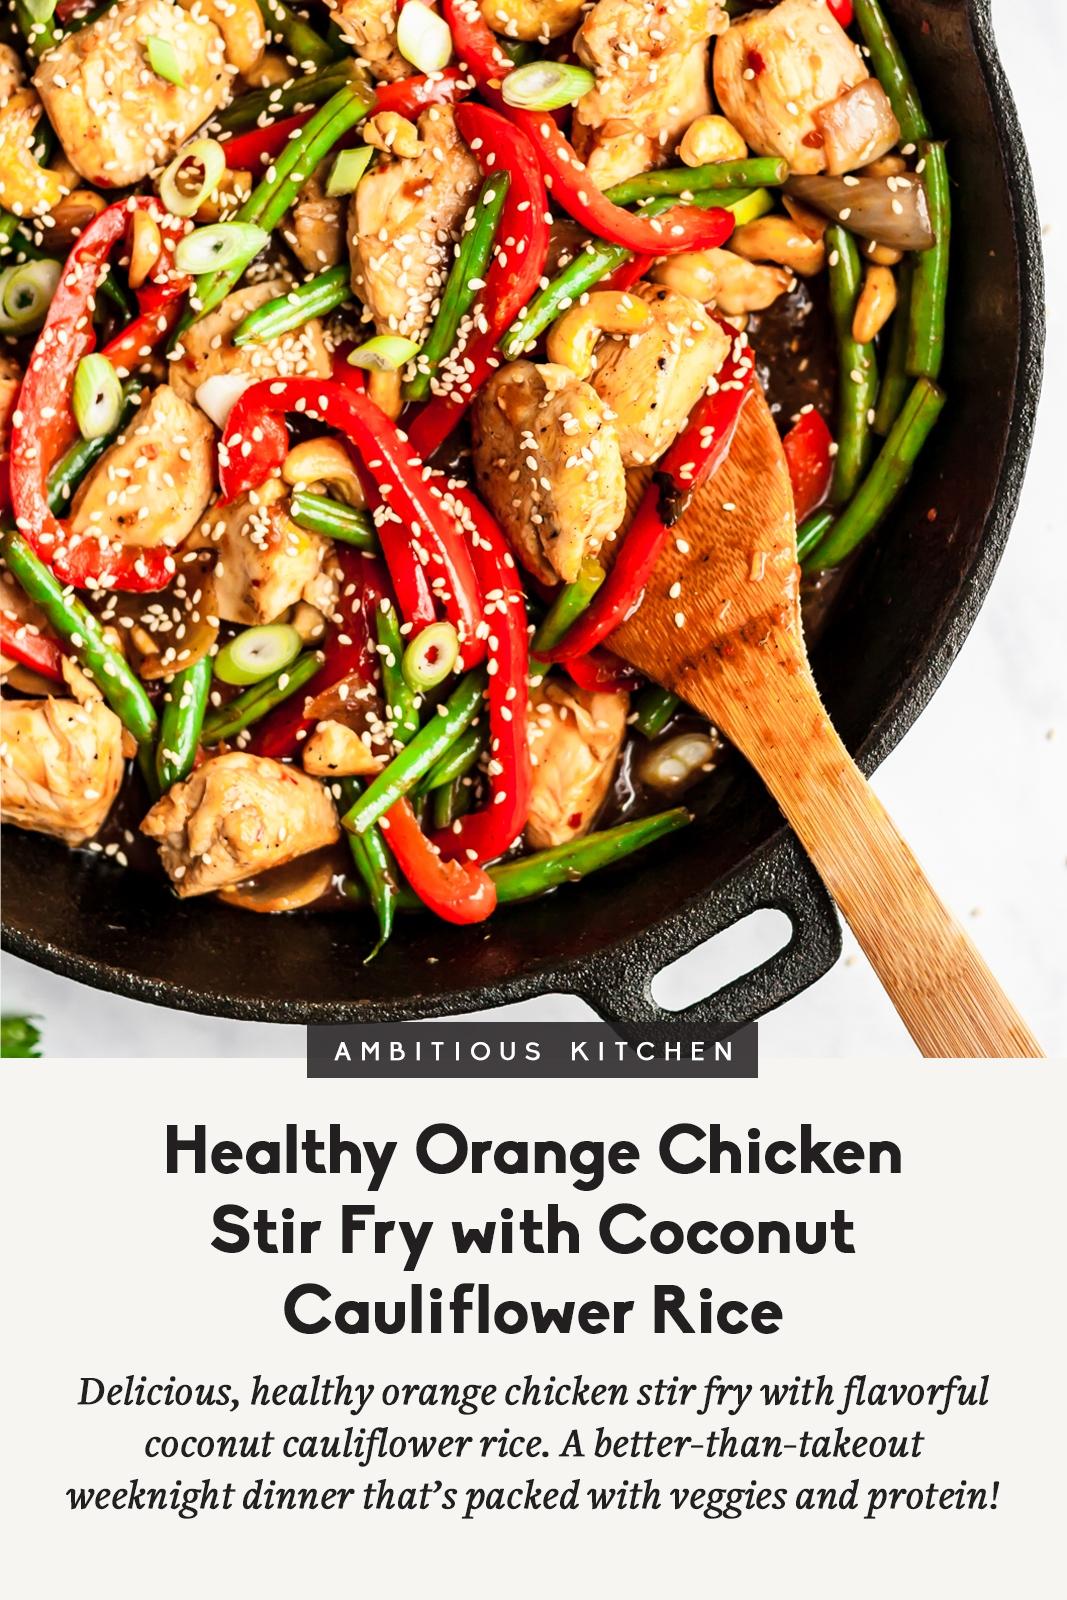 healthy orange chicken stir fry in a skillet with text underneath